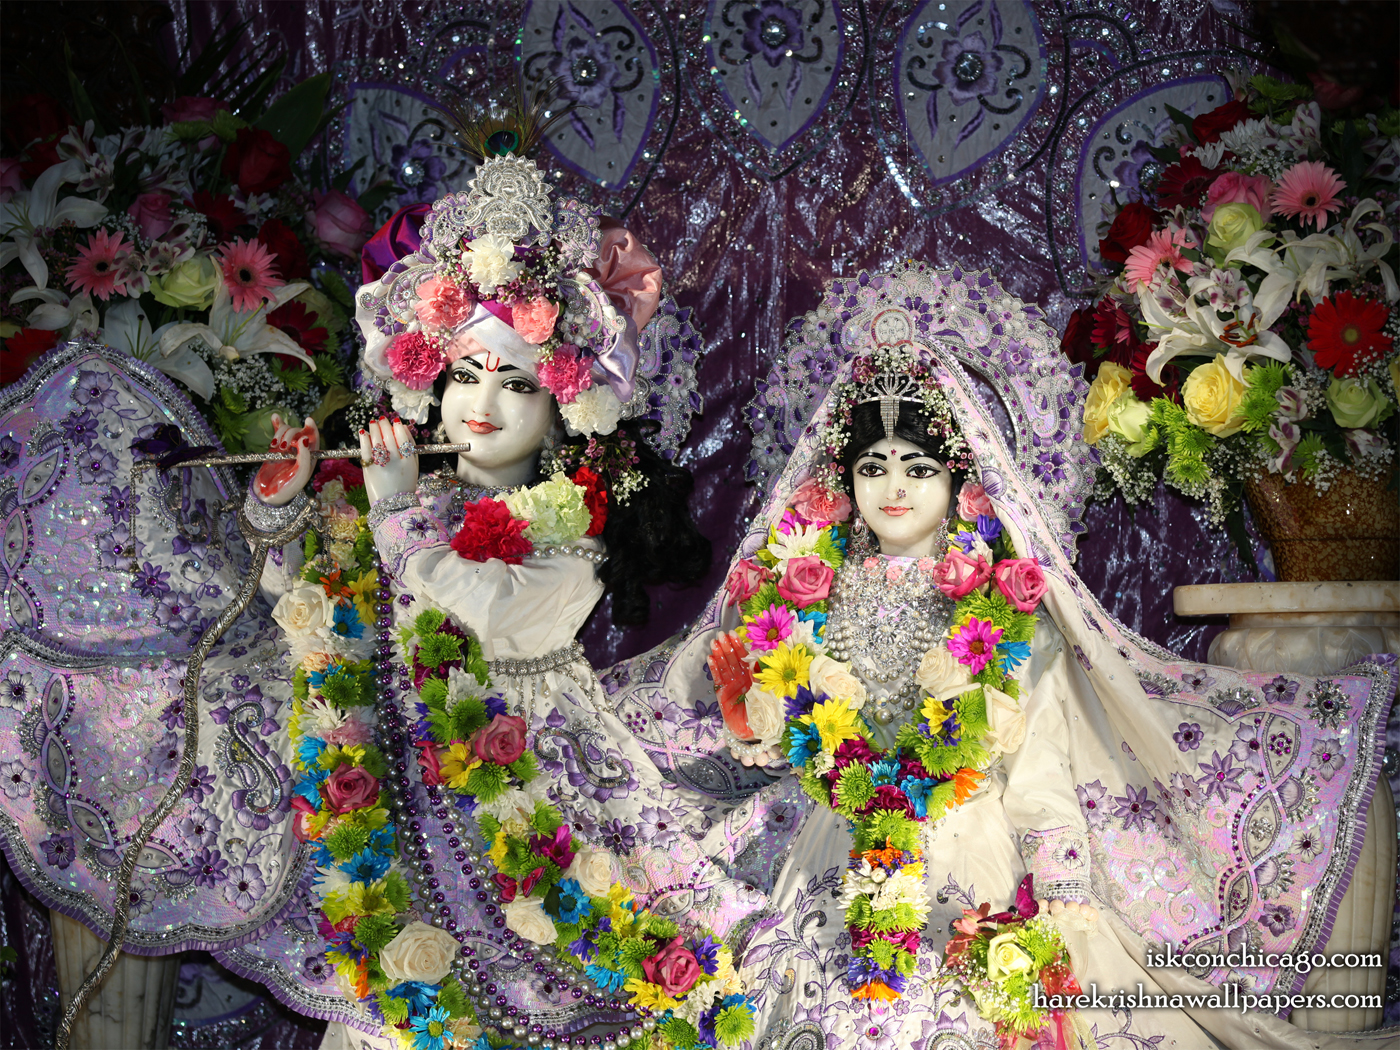 Sri Sri Kishore Kishori Close up Wallpaper (012) Size 1400x1050 Download